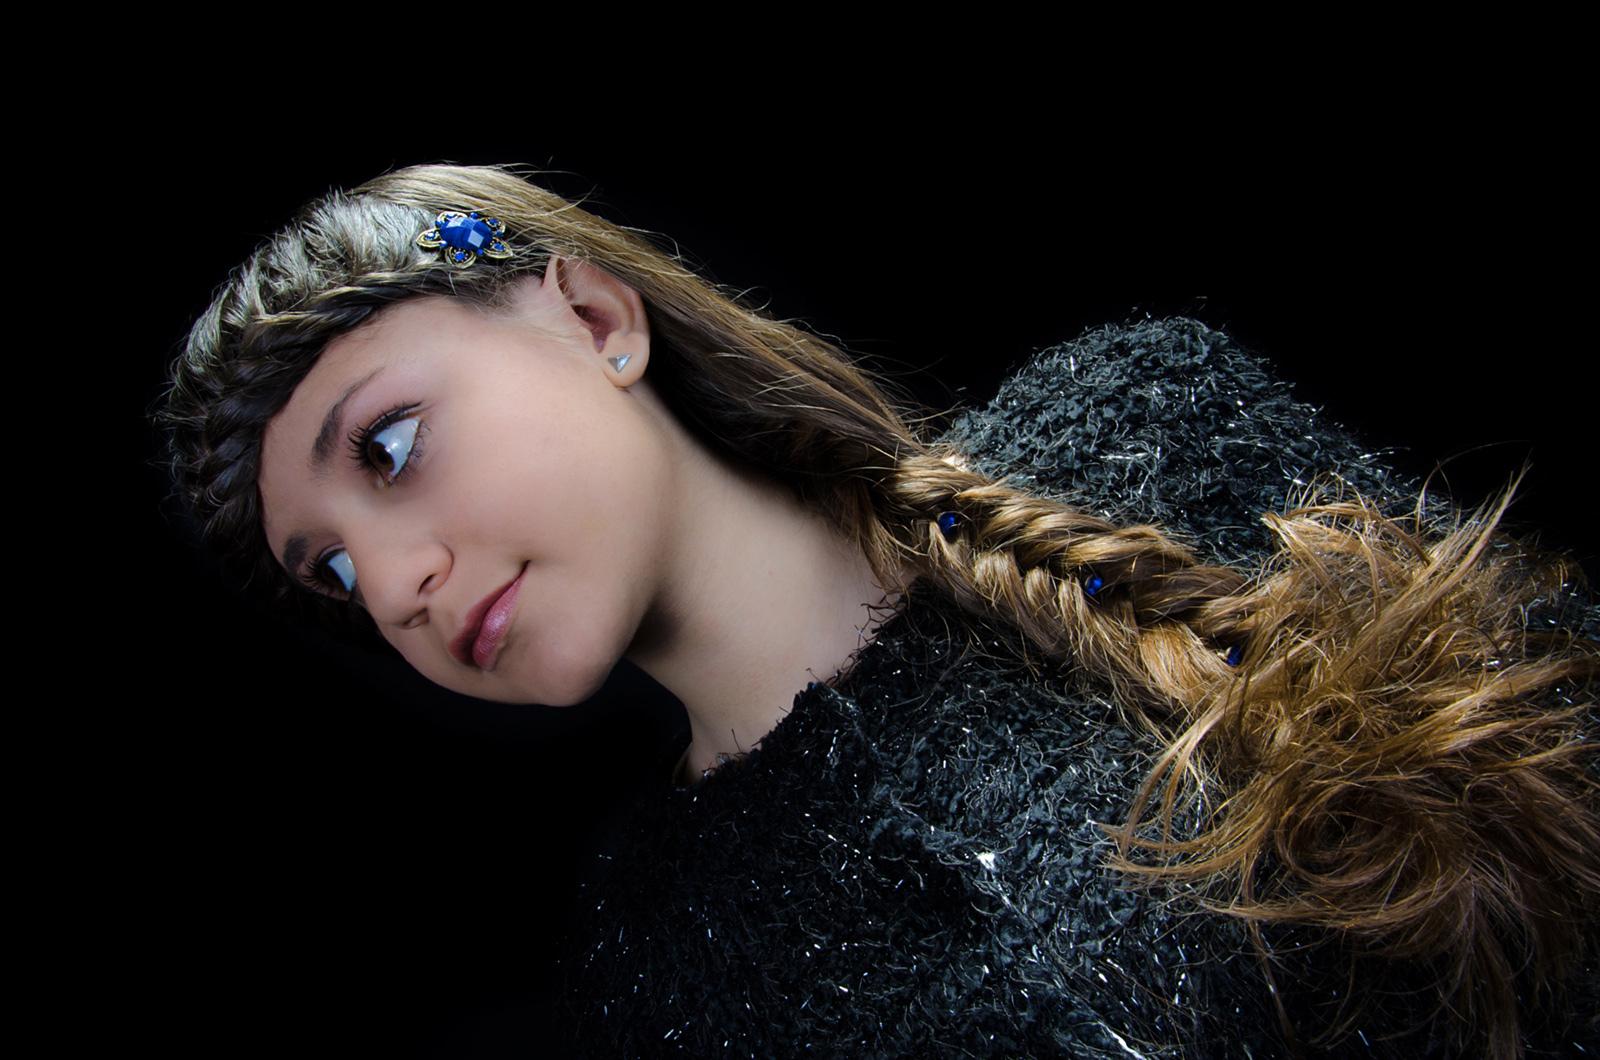 immagine_donna_parrucchieri_torregrotta_messina_estetista_parrucchiere_uomo-donna_cosmetici_salone_valeria12